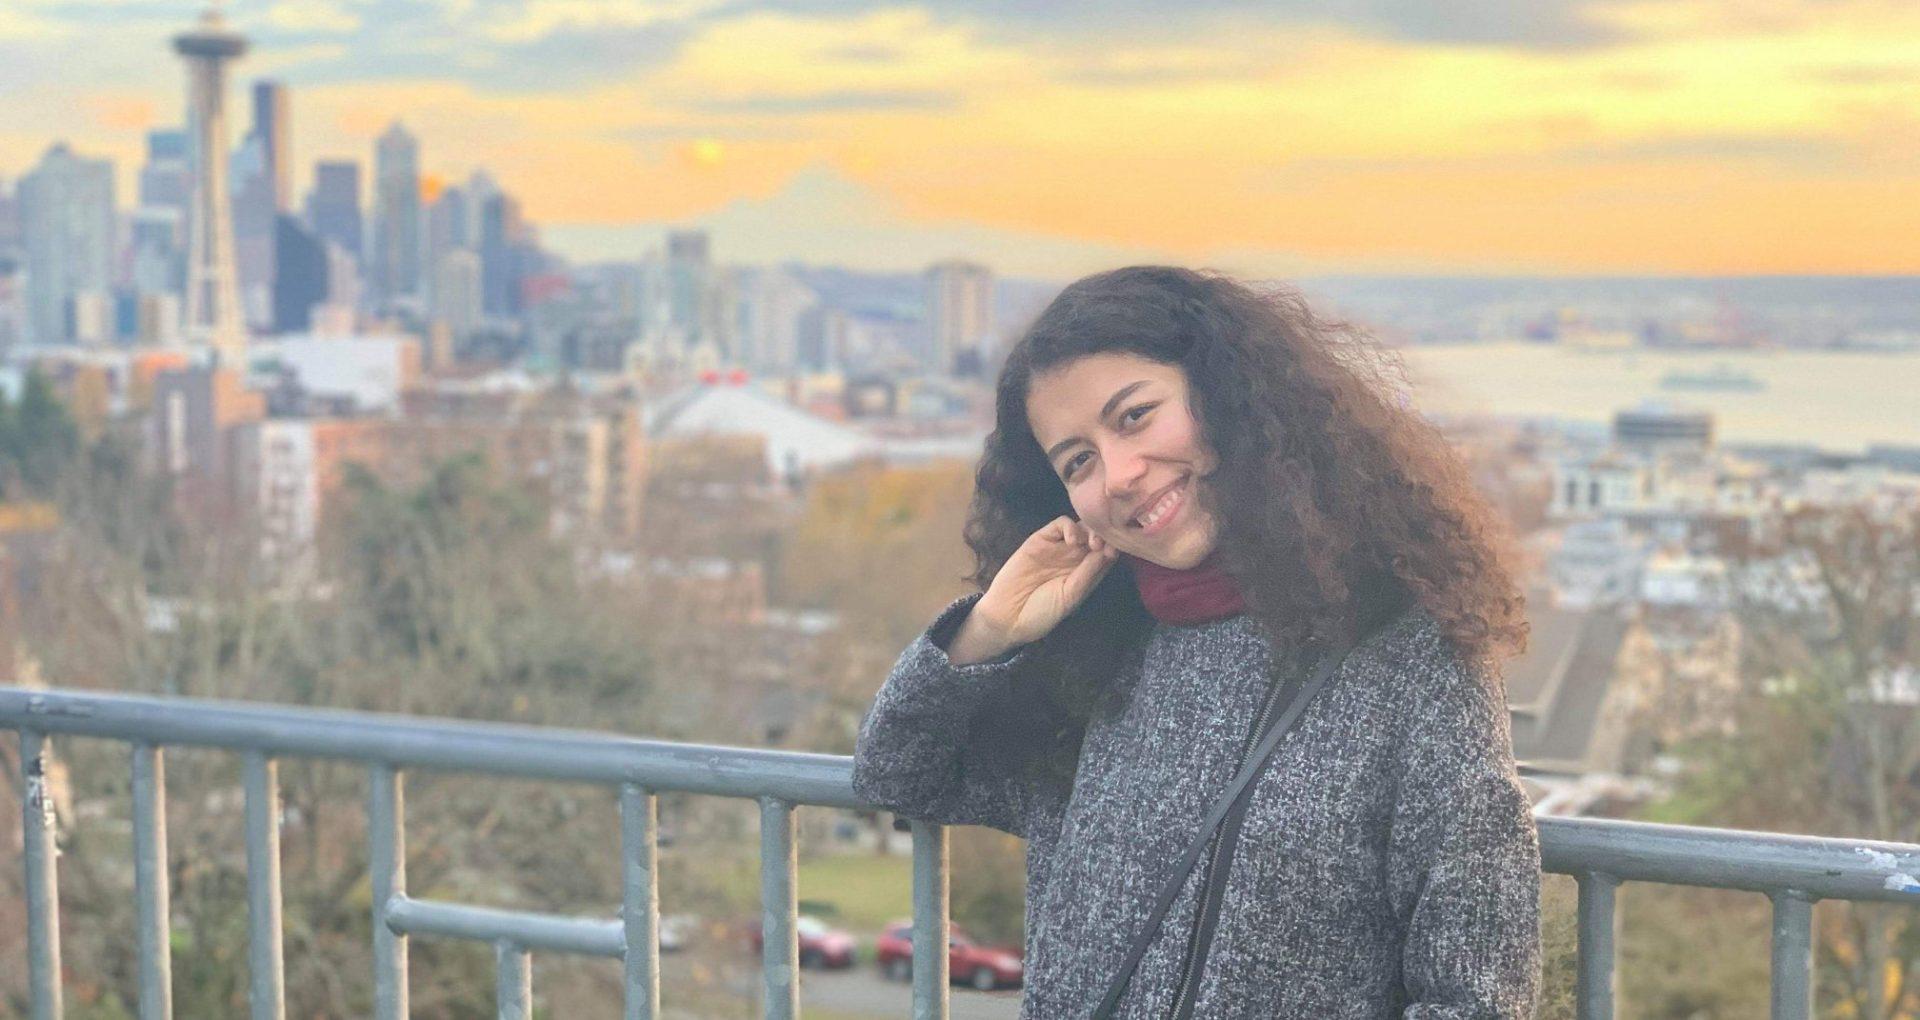 IT manager în Cehia: povestea Anei Chetrari